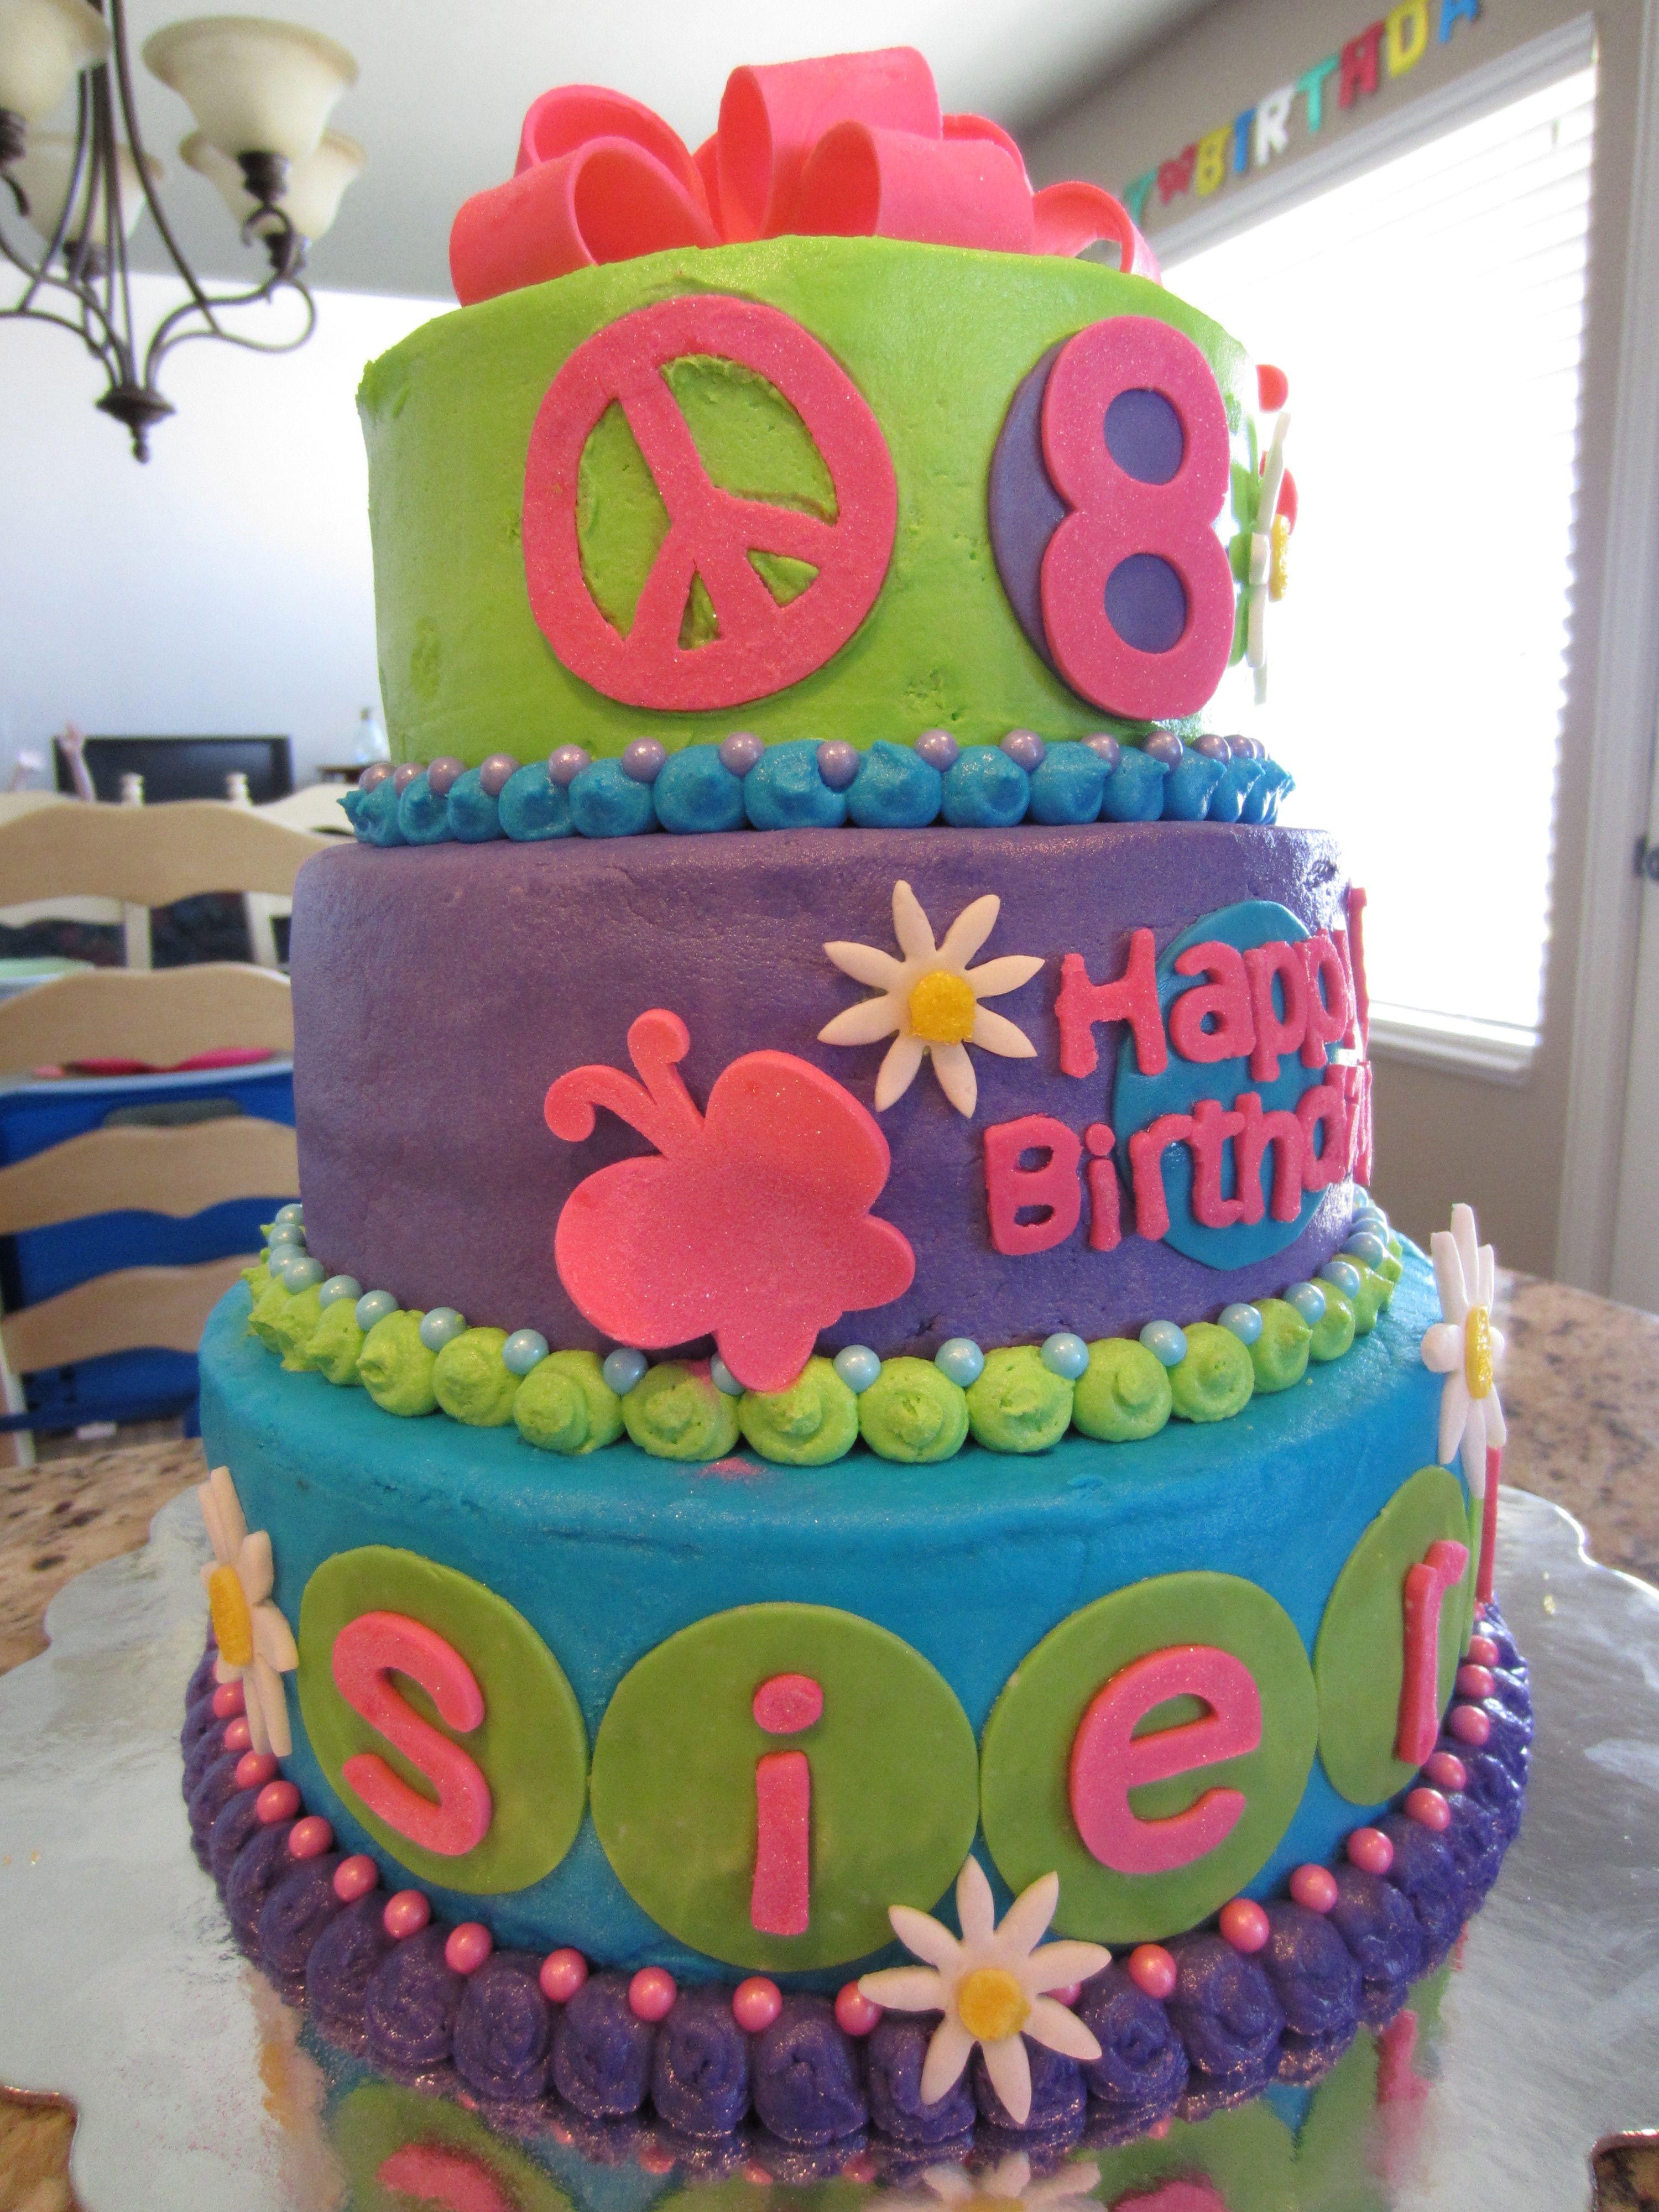 8 yearold girl Birthday Cake Things Ive made Pinterest